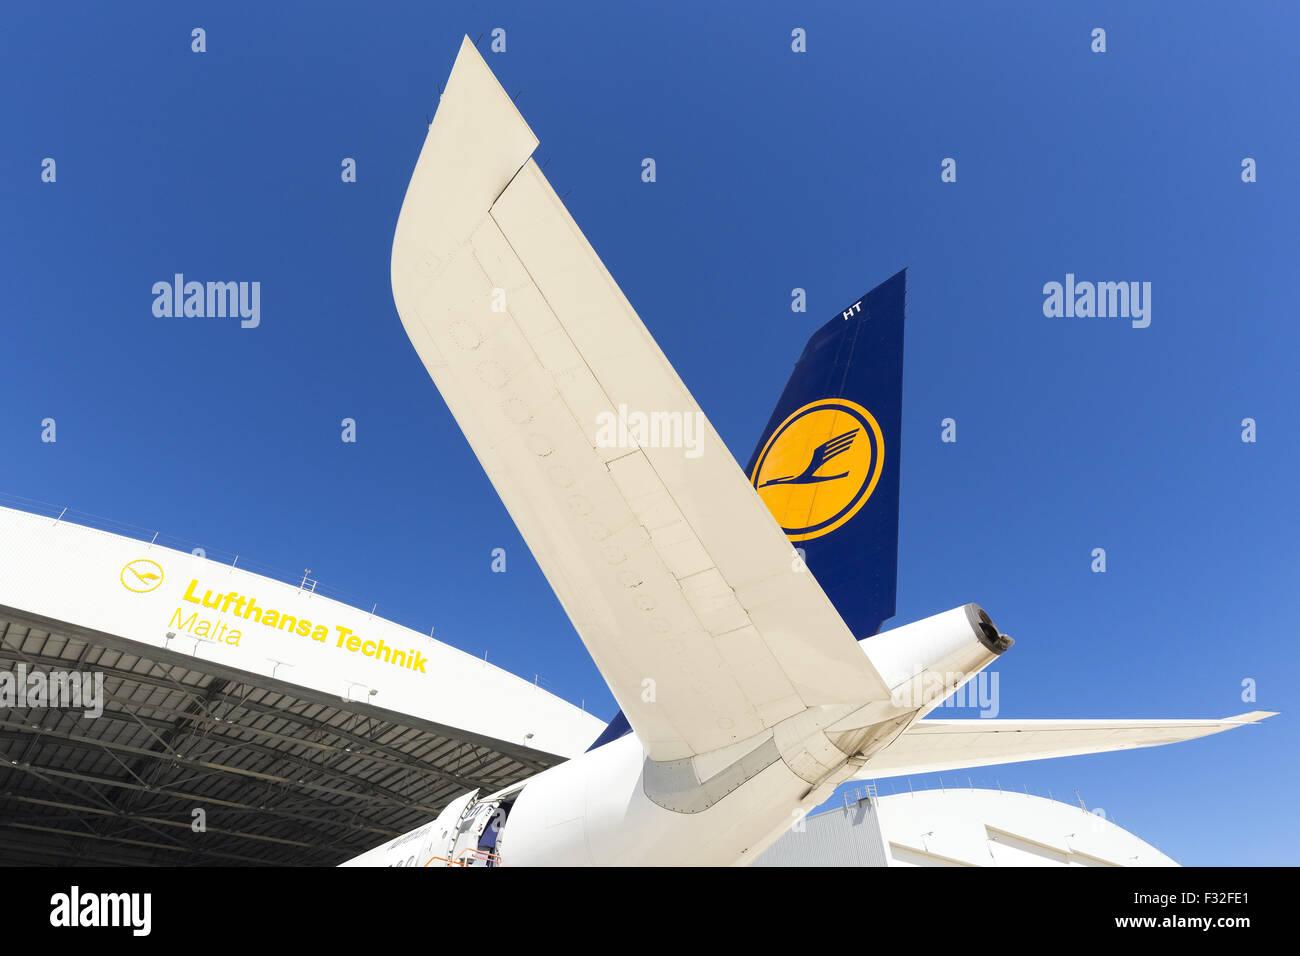 Lufhansa Airbus A340-600 being serviced at Lufhansa Technik Malta. - Stock Image